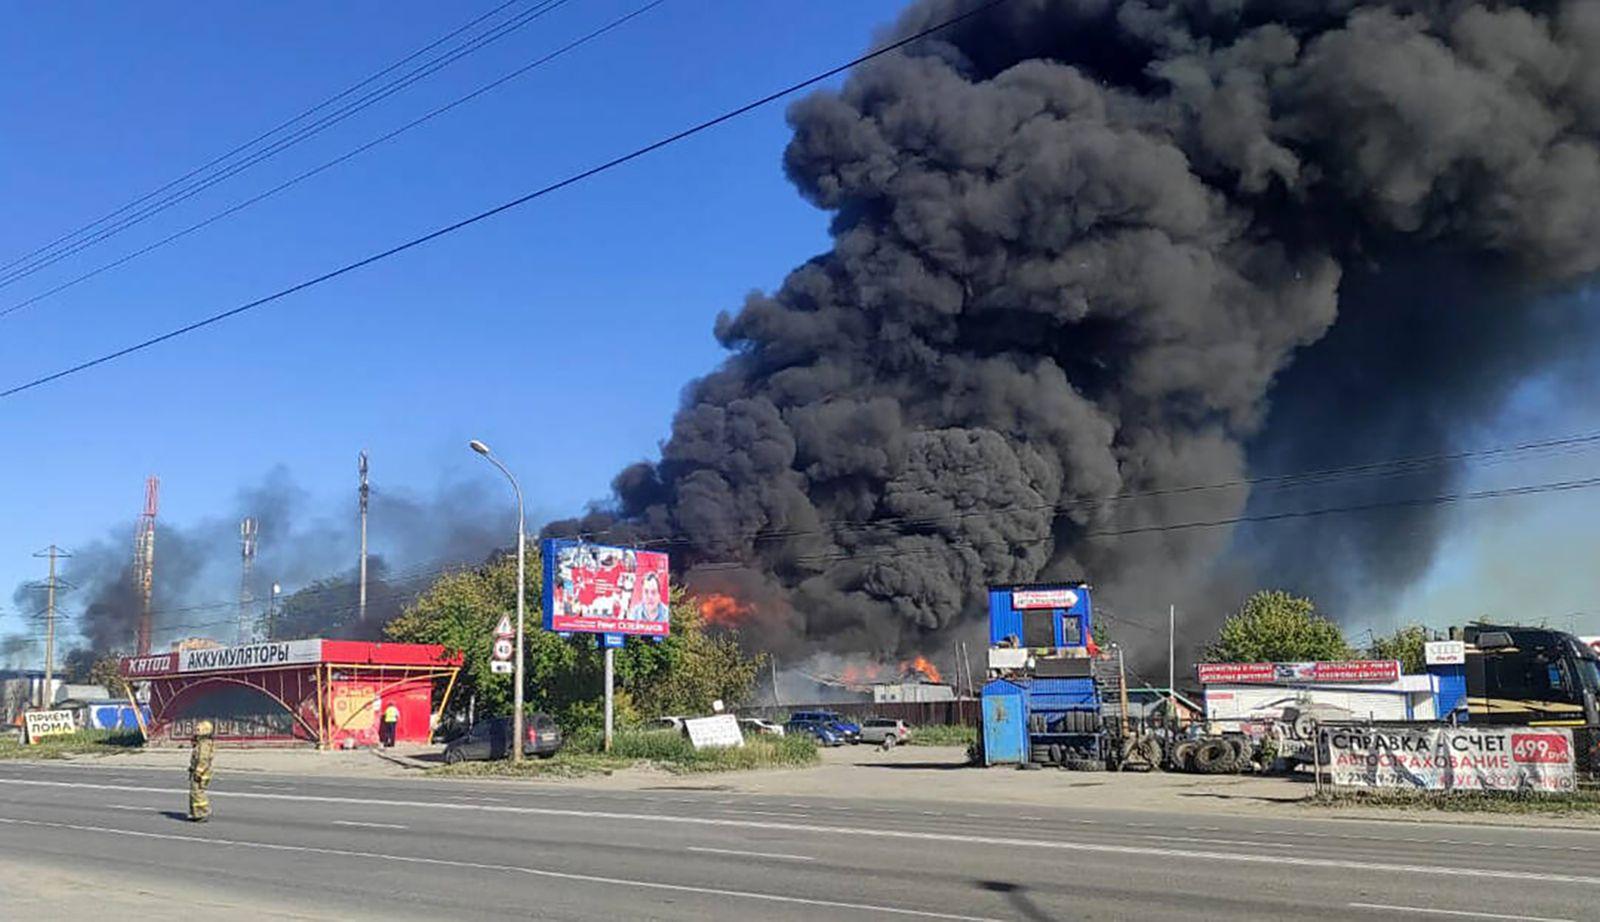 NOVOSIBIRSK, RUSSIA - JUNE 14, 2021: Smoke billows from a fire-hit Yevrogaz fuel filling station on Gusinobrodskoye Hig